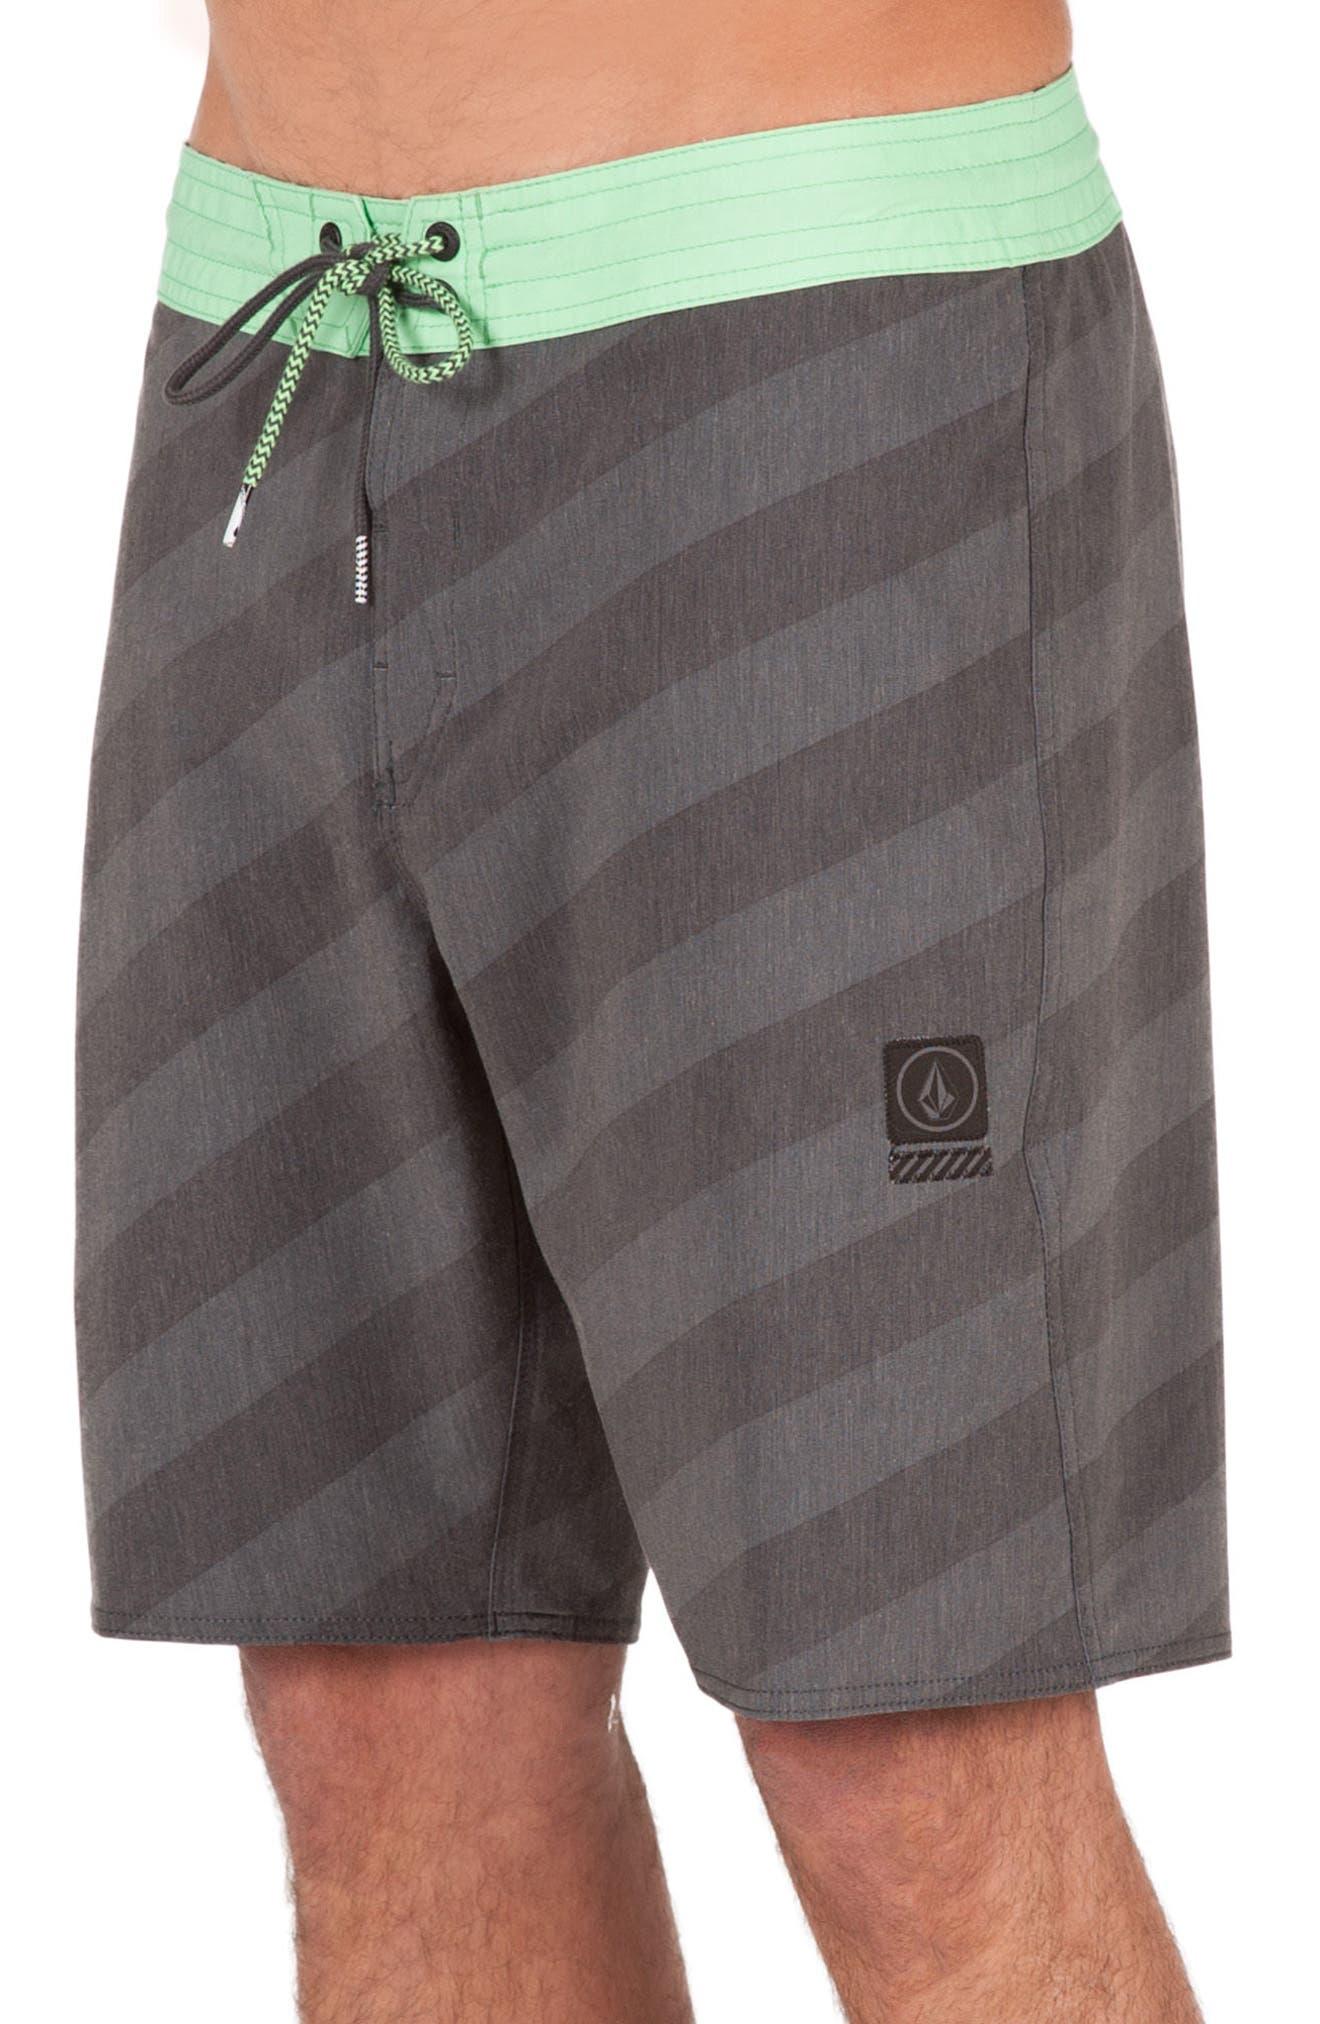 Stripey Slinger Board Shorts,                             Alternate thumbnail 19, color,